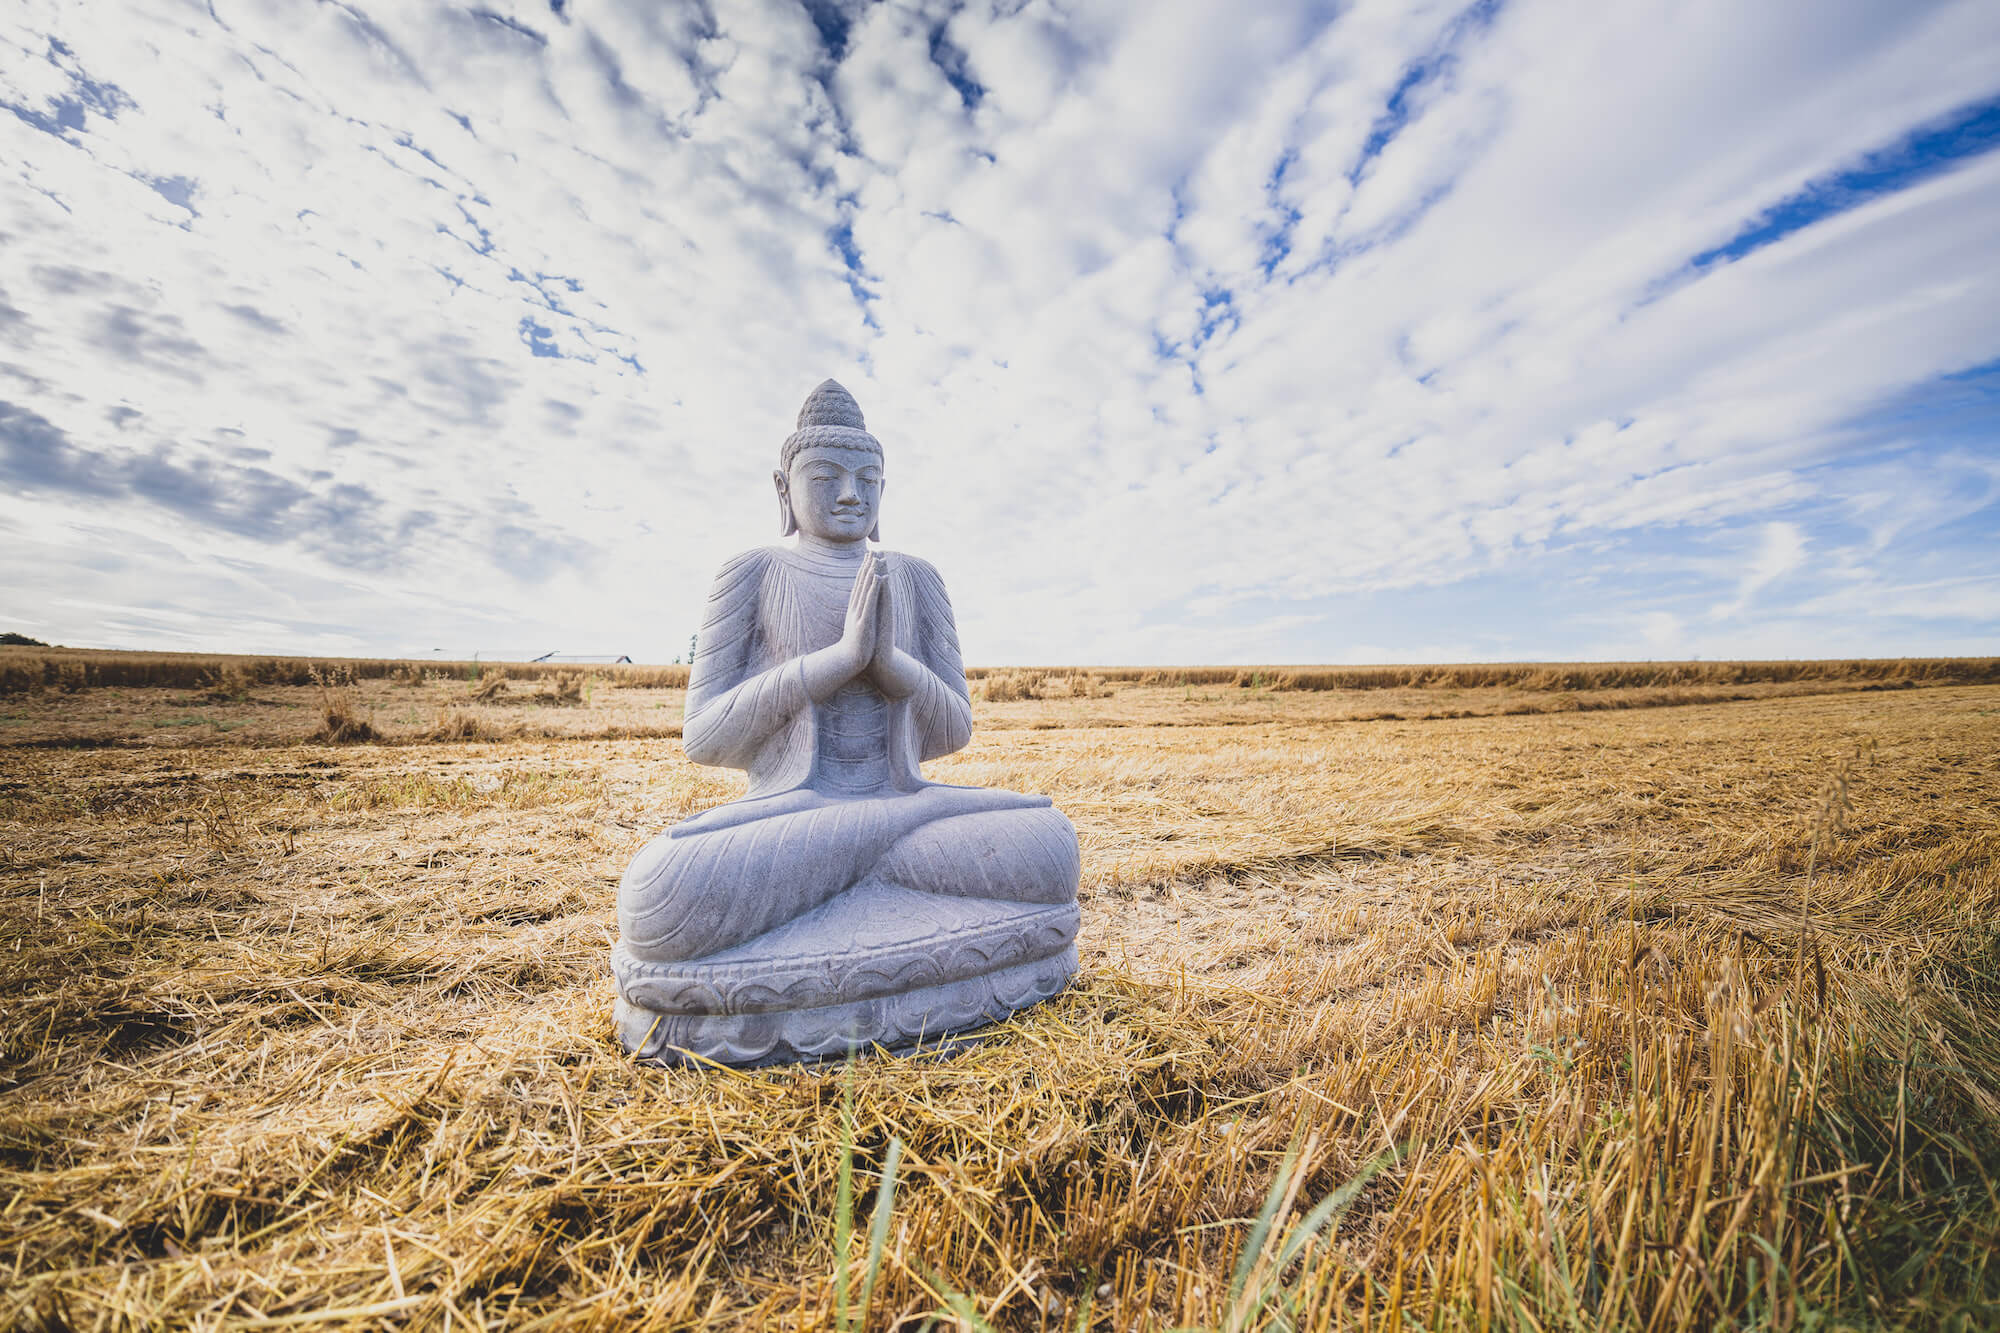 Große Buddha Statuen immer beliebter